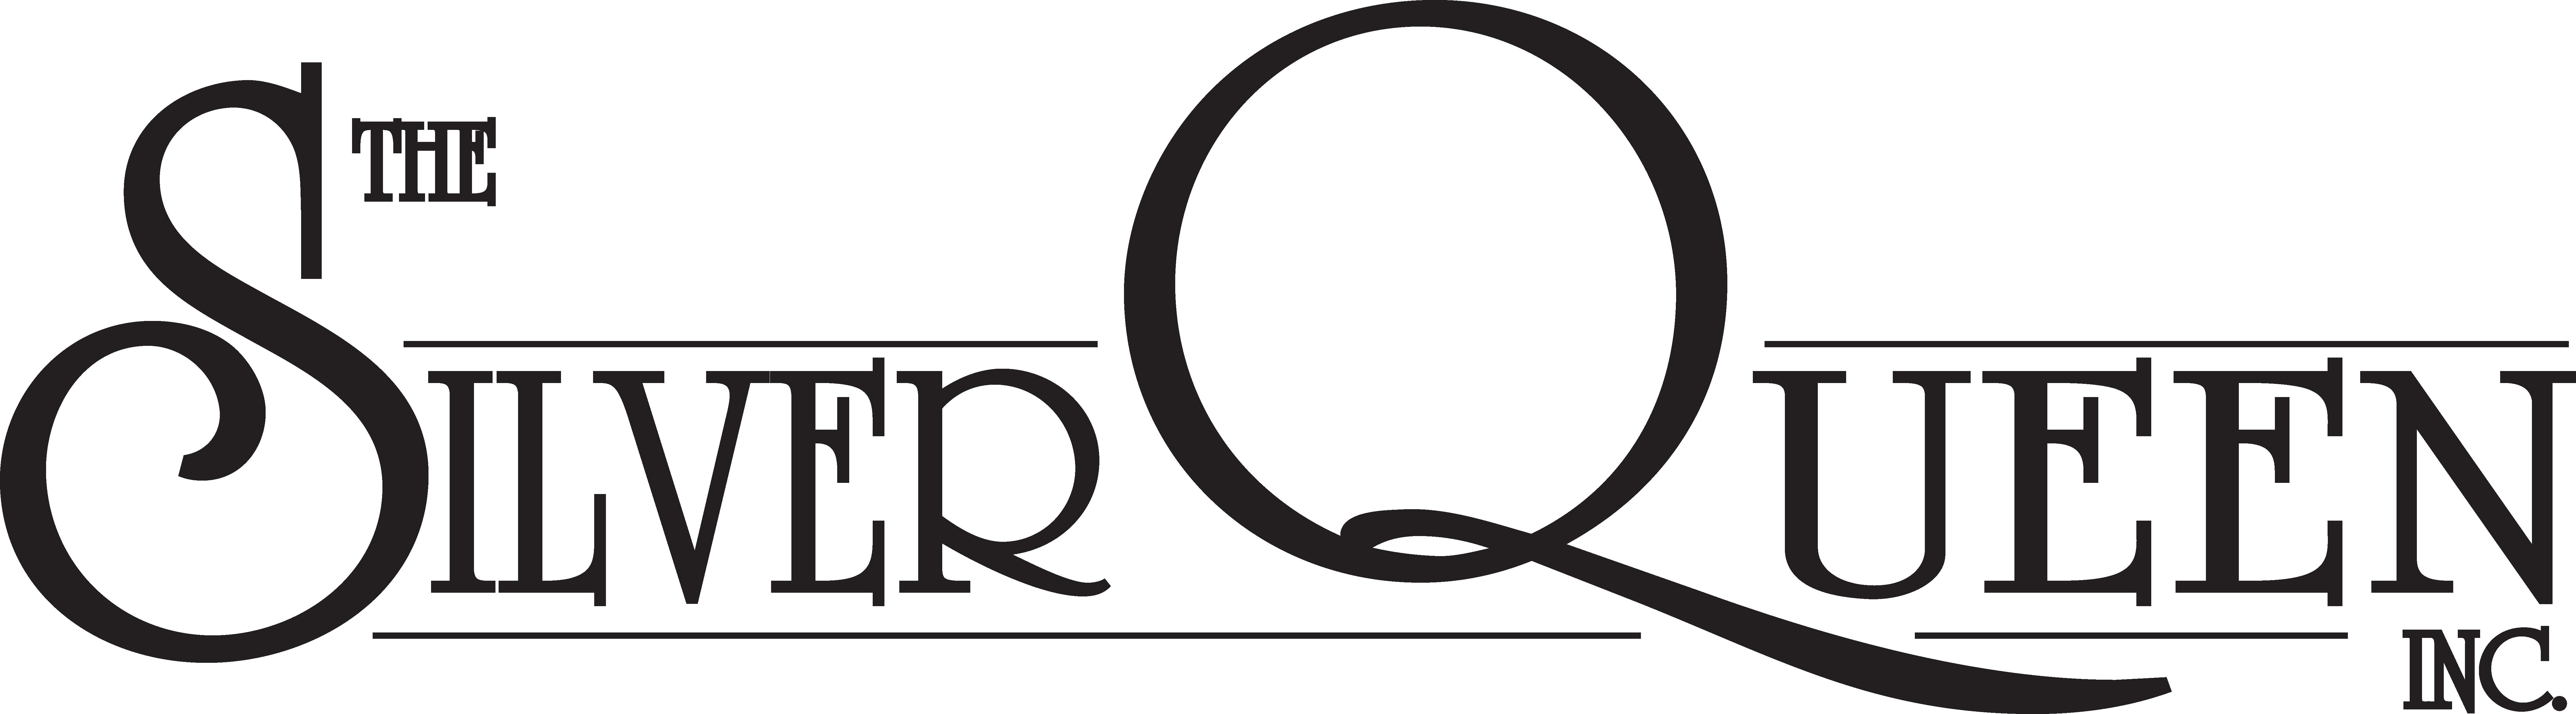 Silver Queen Logo PNG